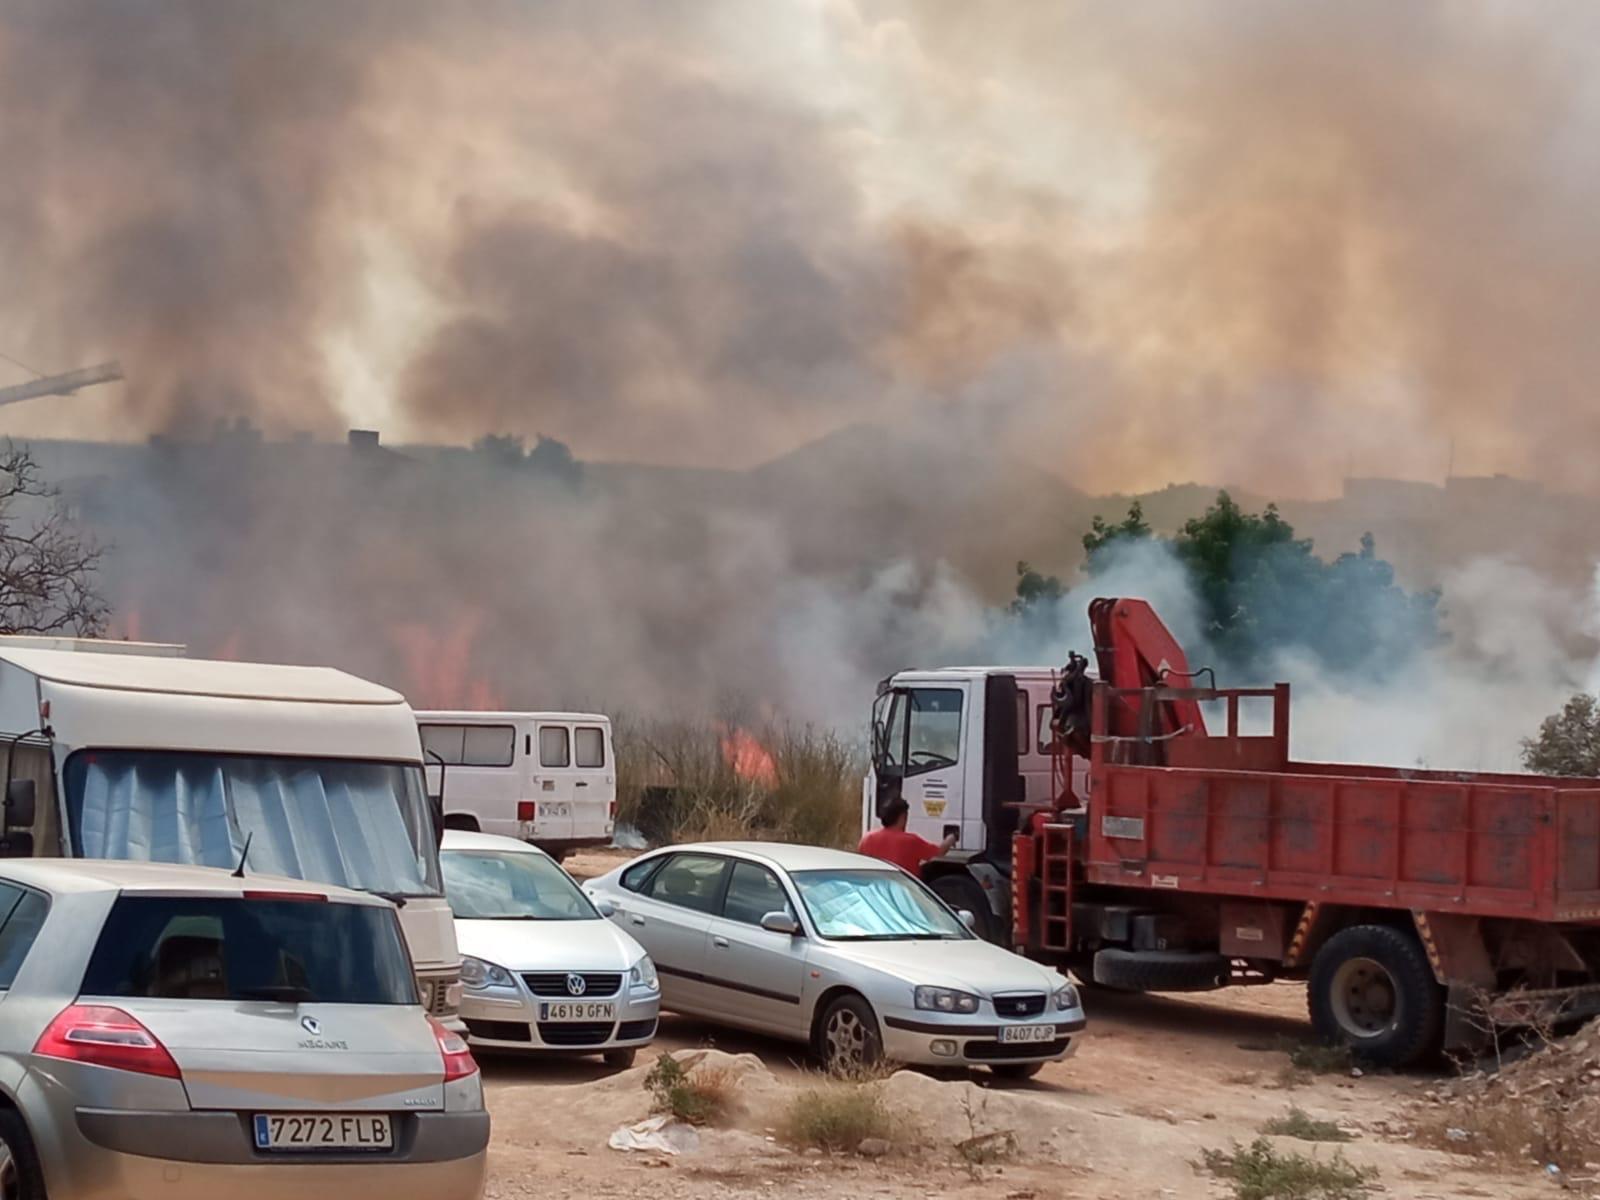 Incendio en una parcela de la Avenida Juan Carlos I Xàbia (1)